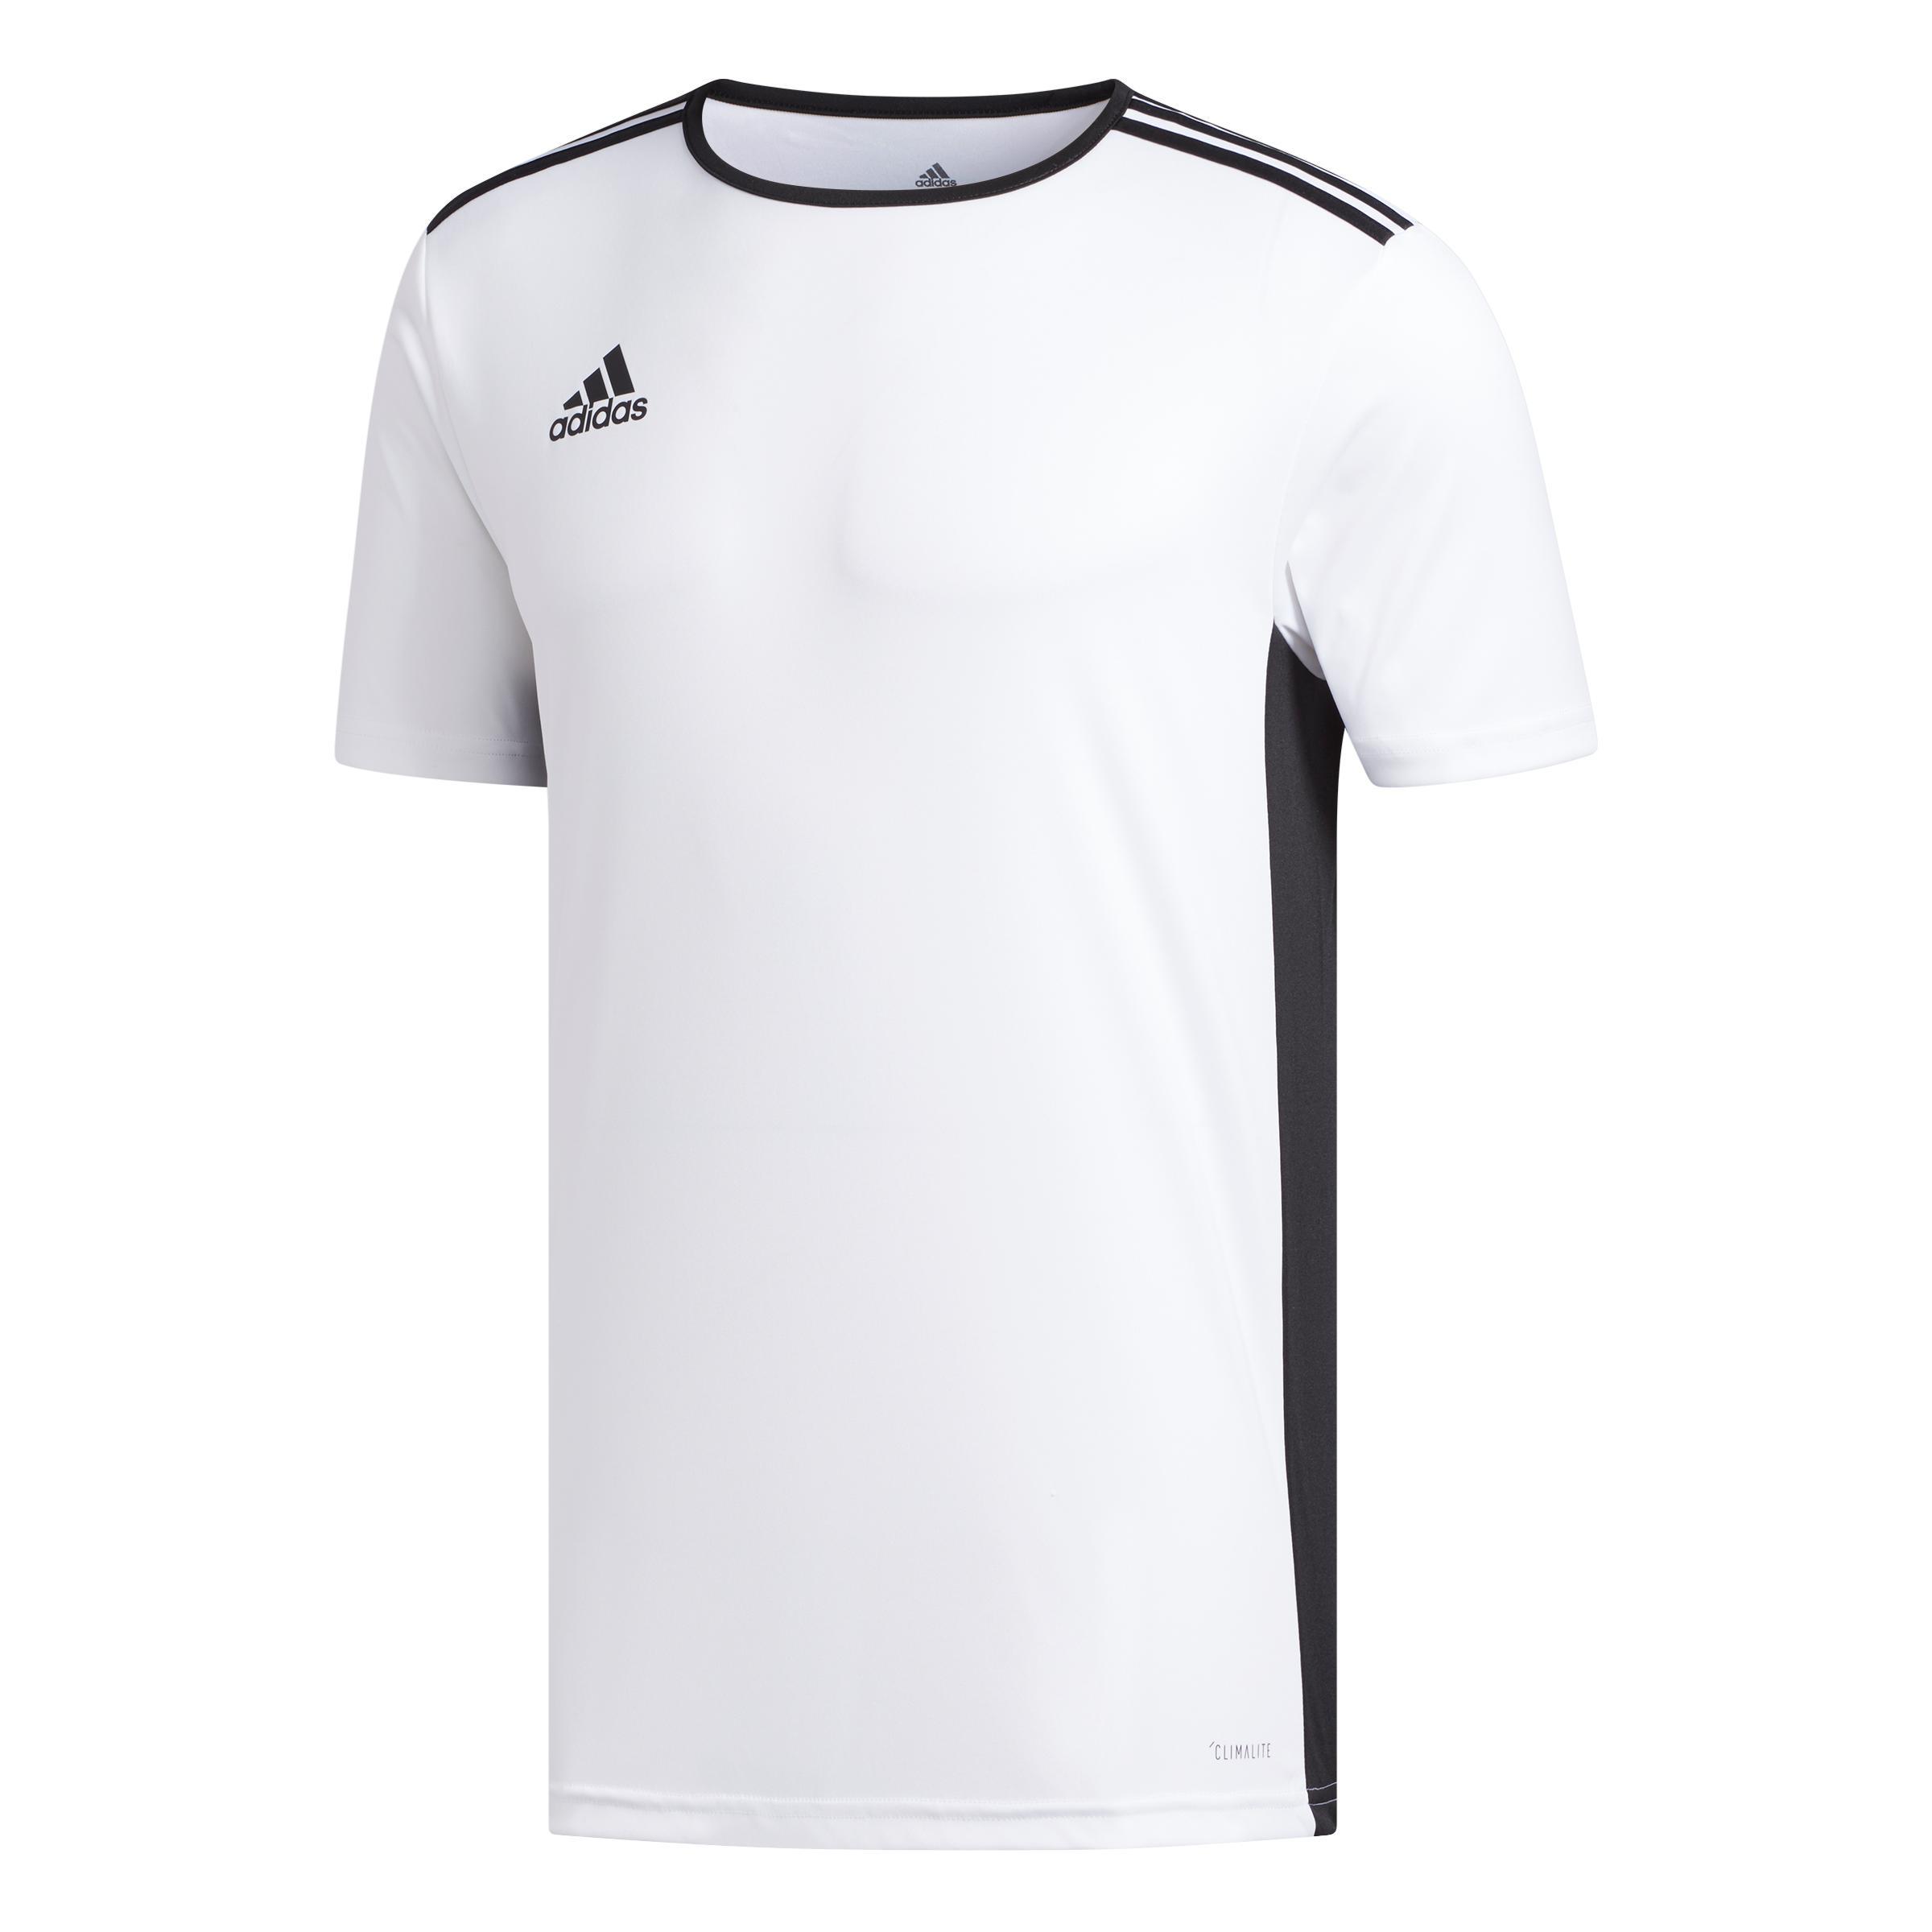 65b96a7241b Voetbalshirts kopen online ← DECATHLON | Nergens goedkoper!